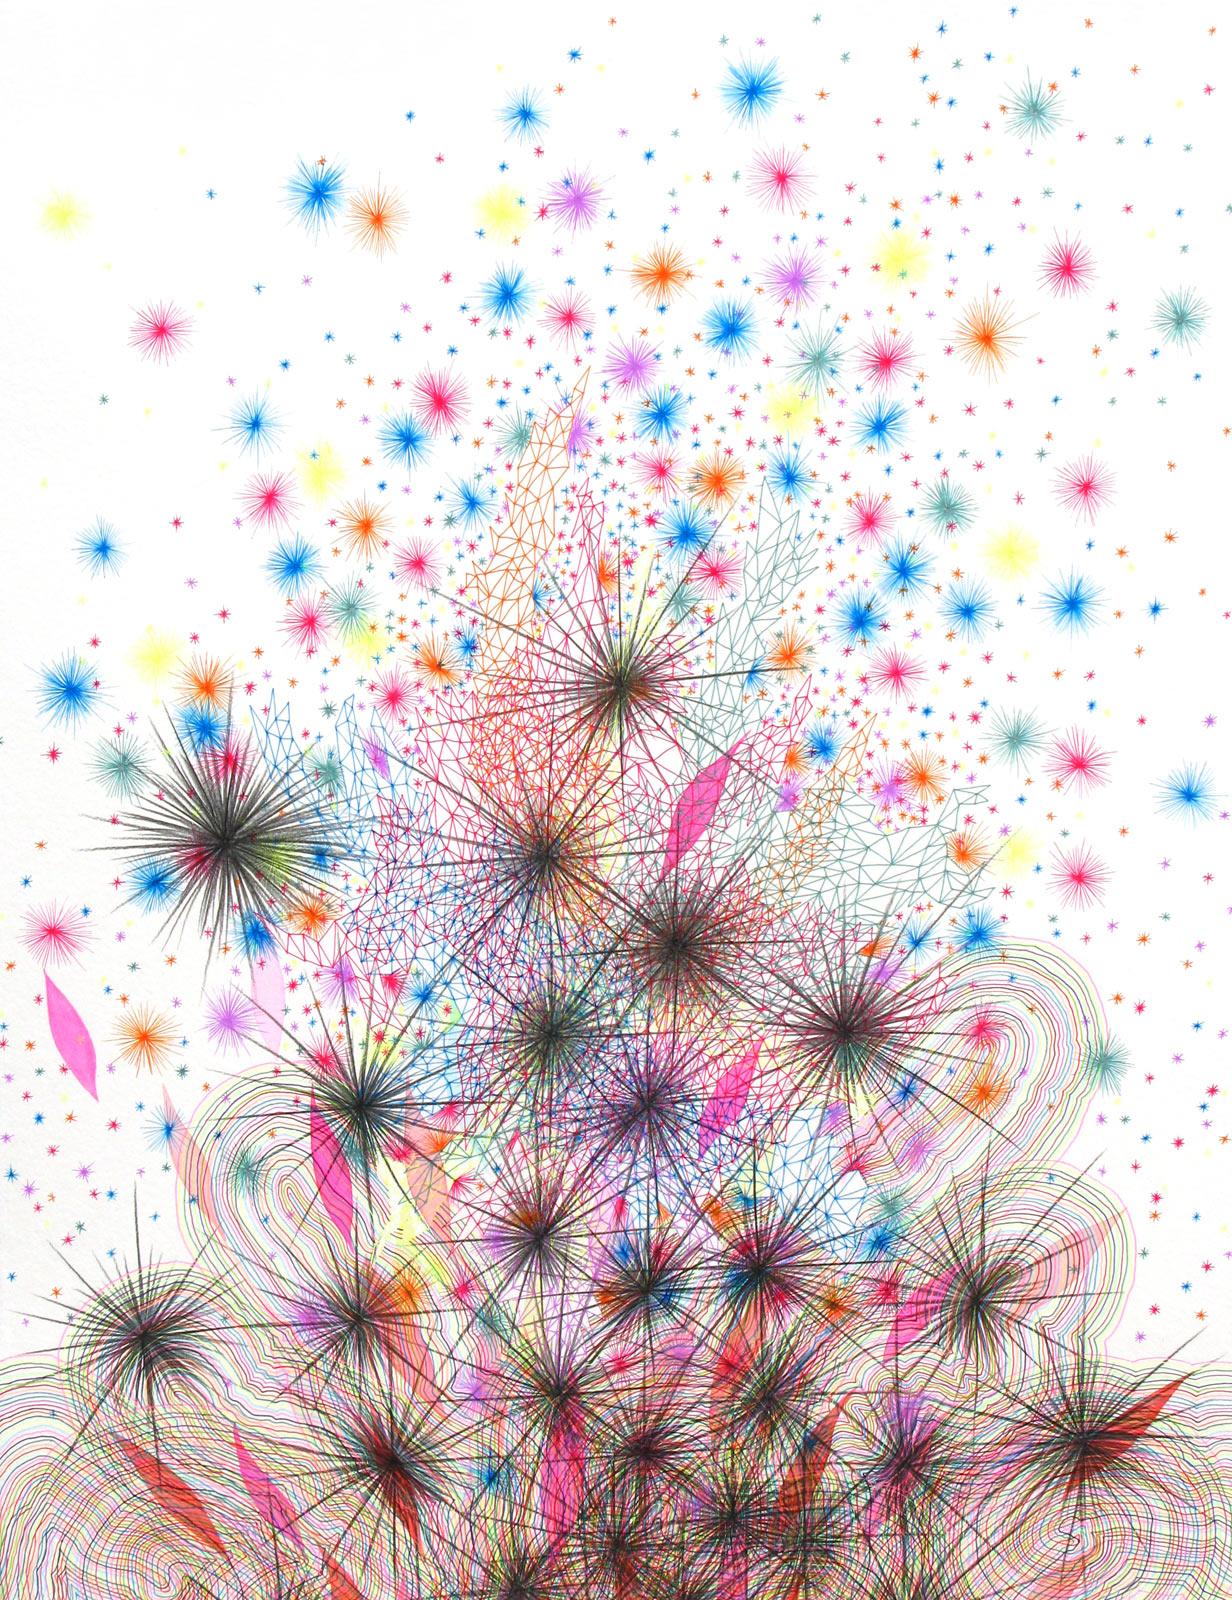 OBrien_D_08_Nebula.jpg